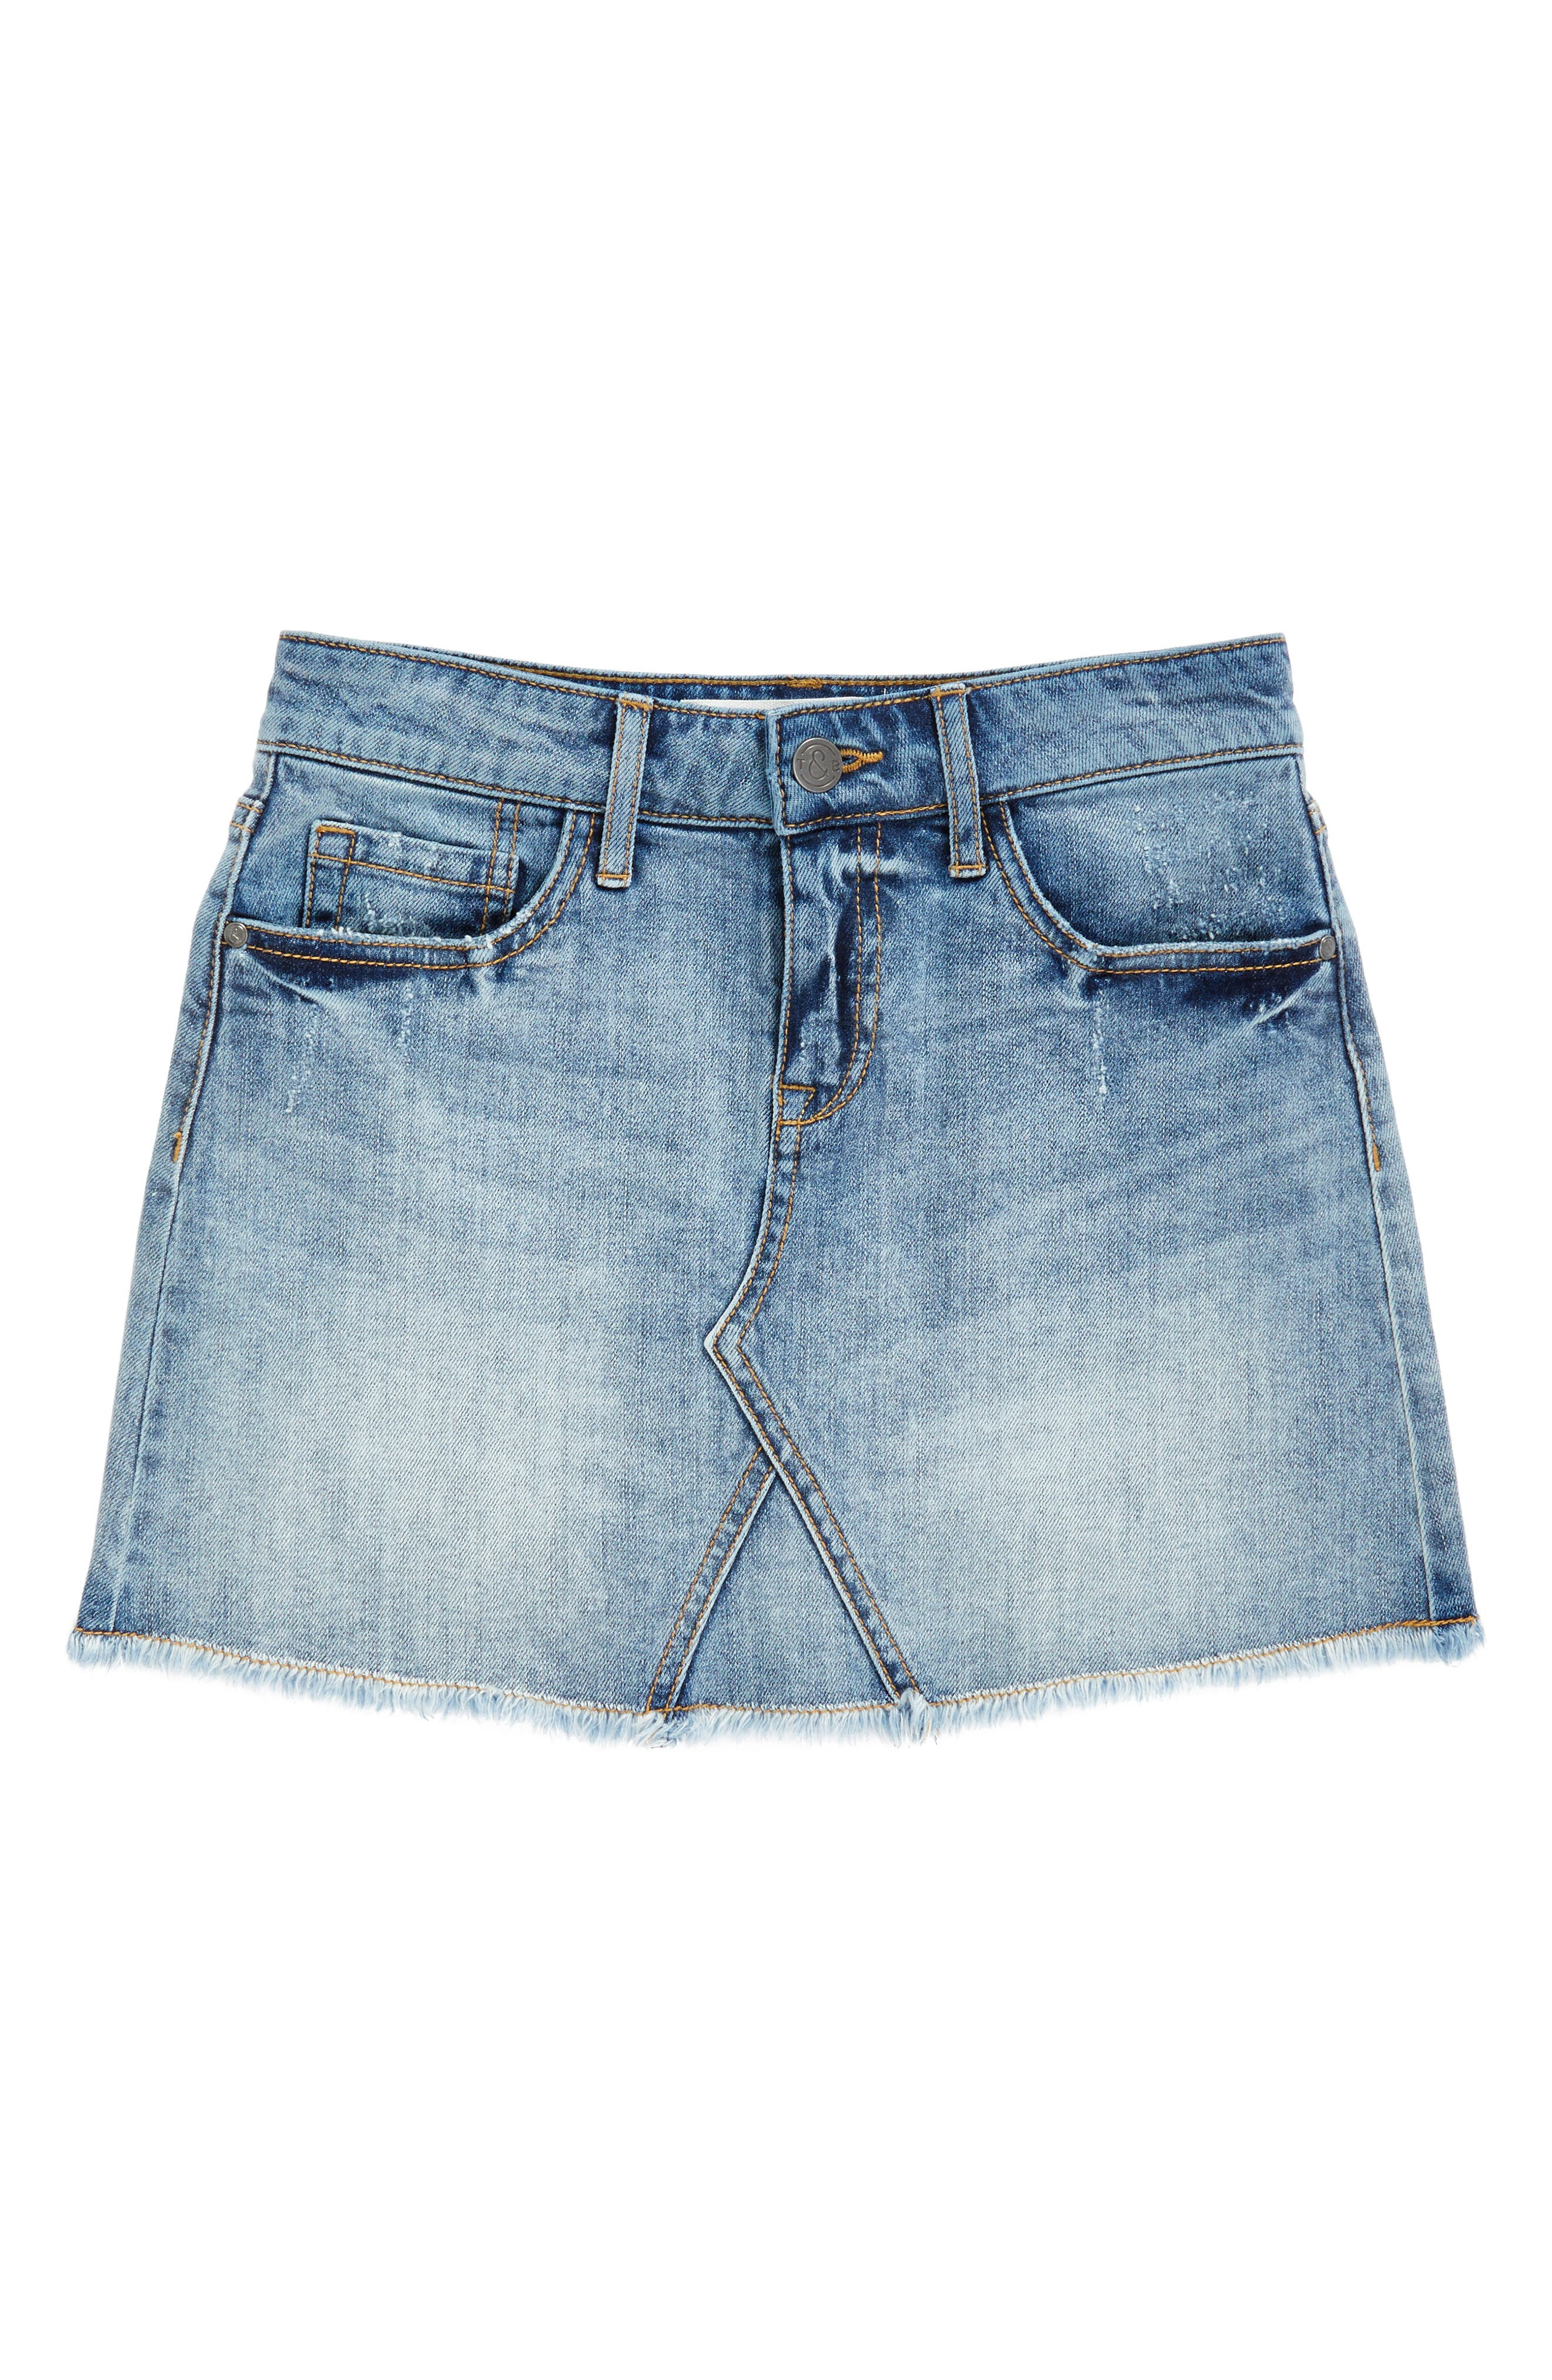 Alternate Image 1 Selected - Treasure & Bond Cutoff Denim Skirt (Big Girls)